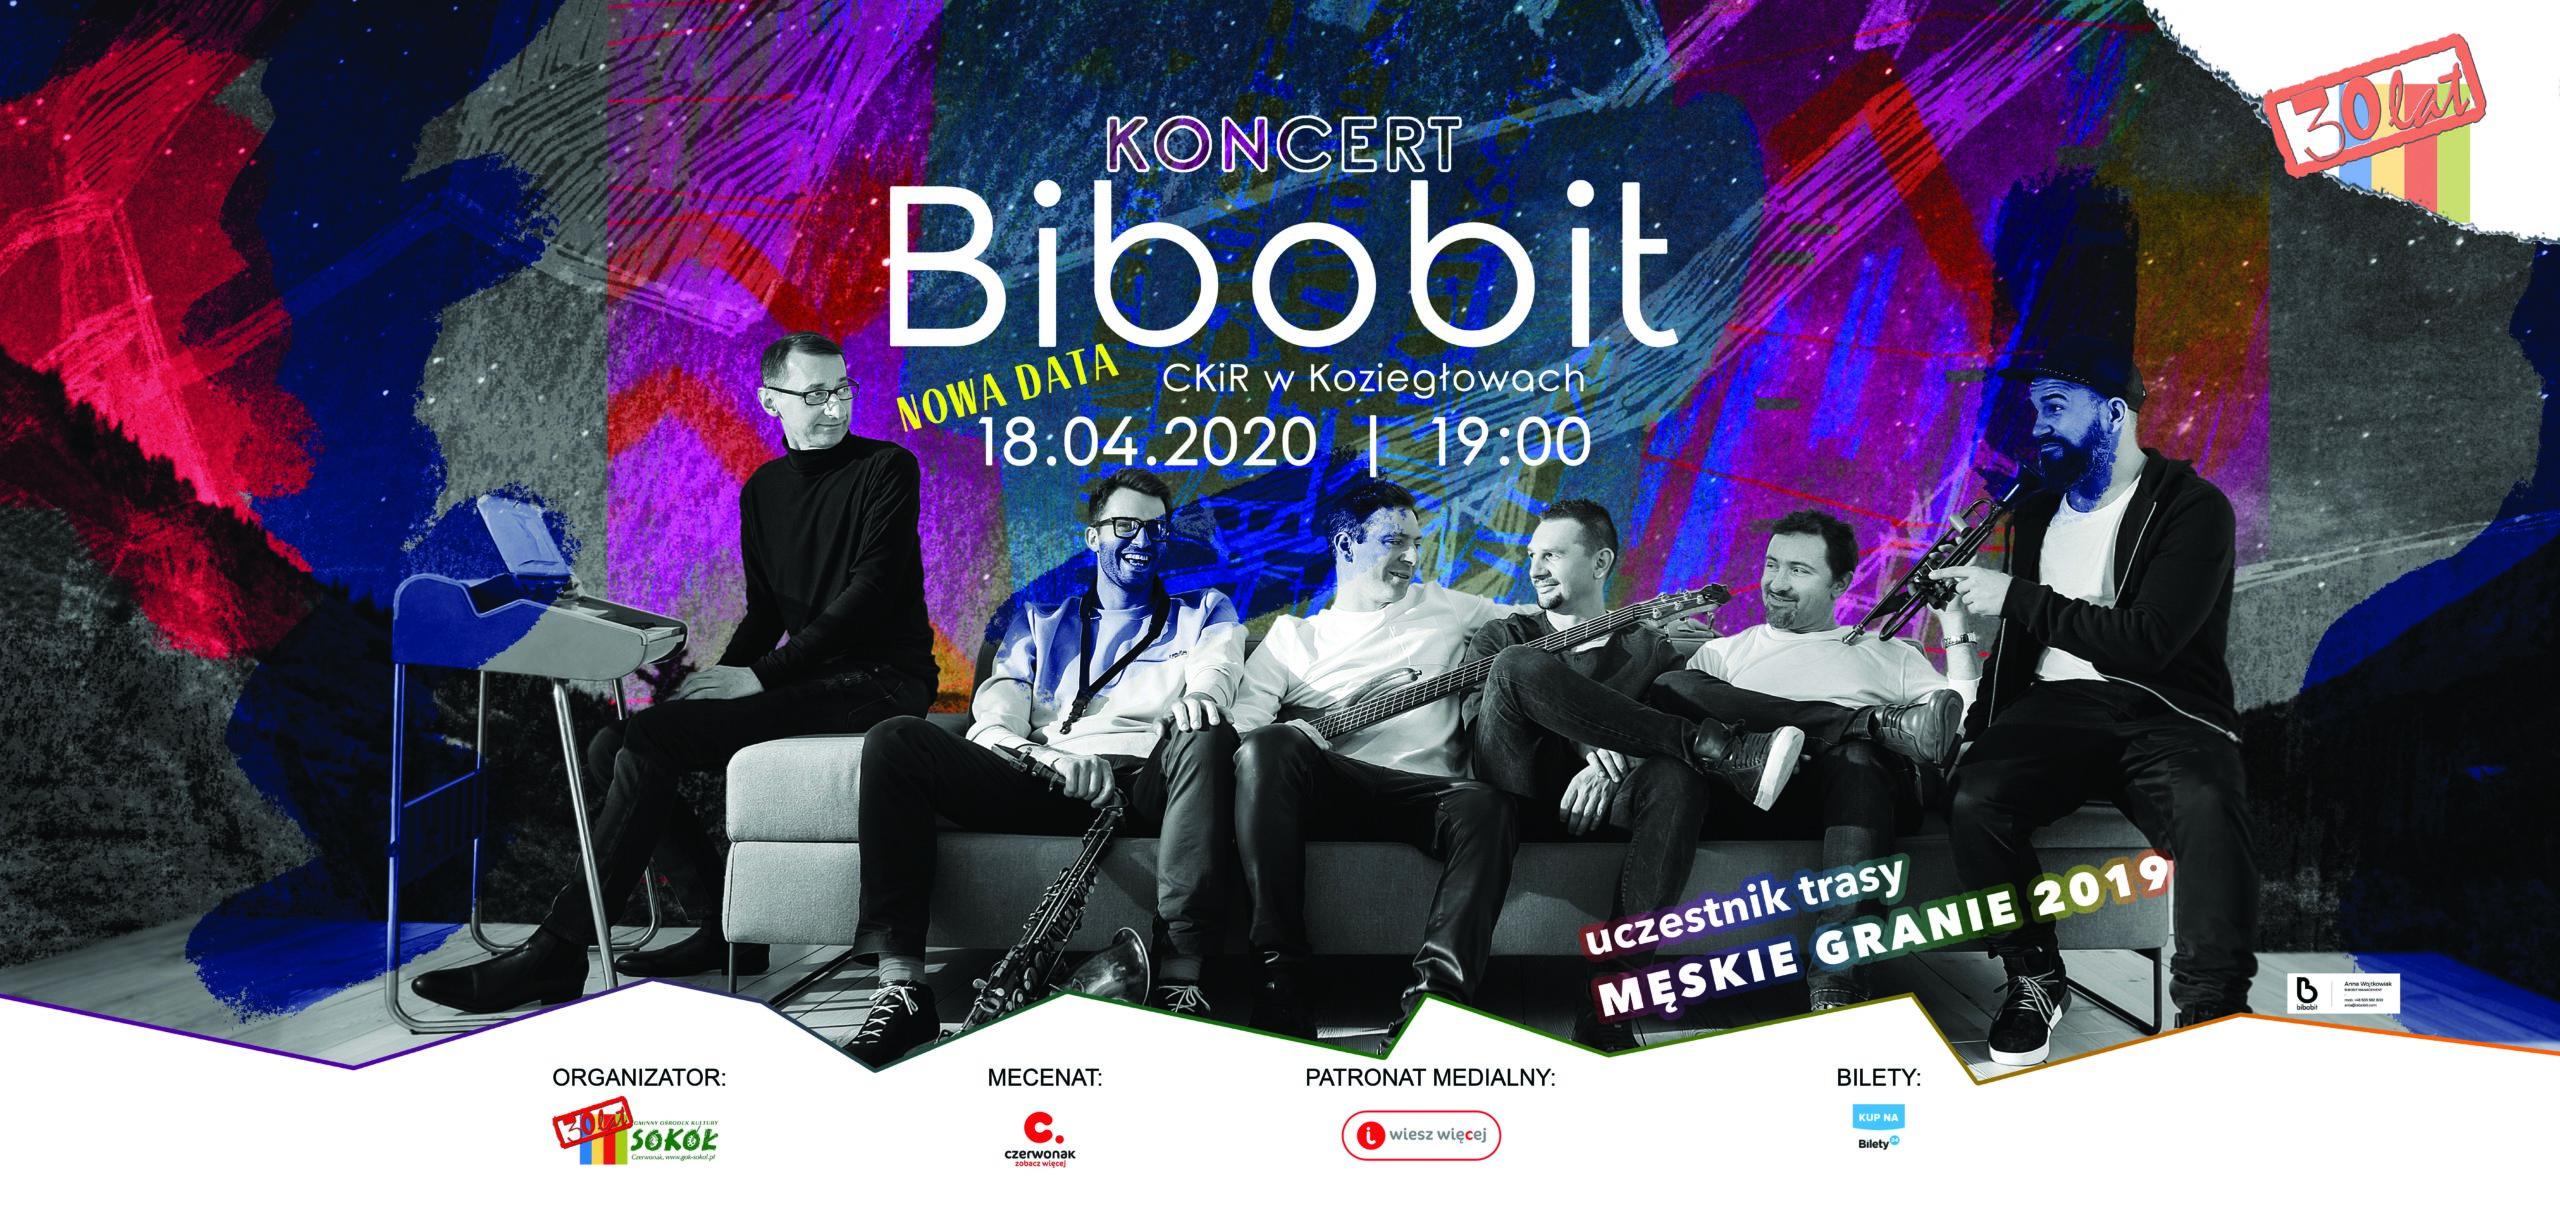 billboard_Bibobit_koncert_podgląd